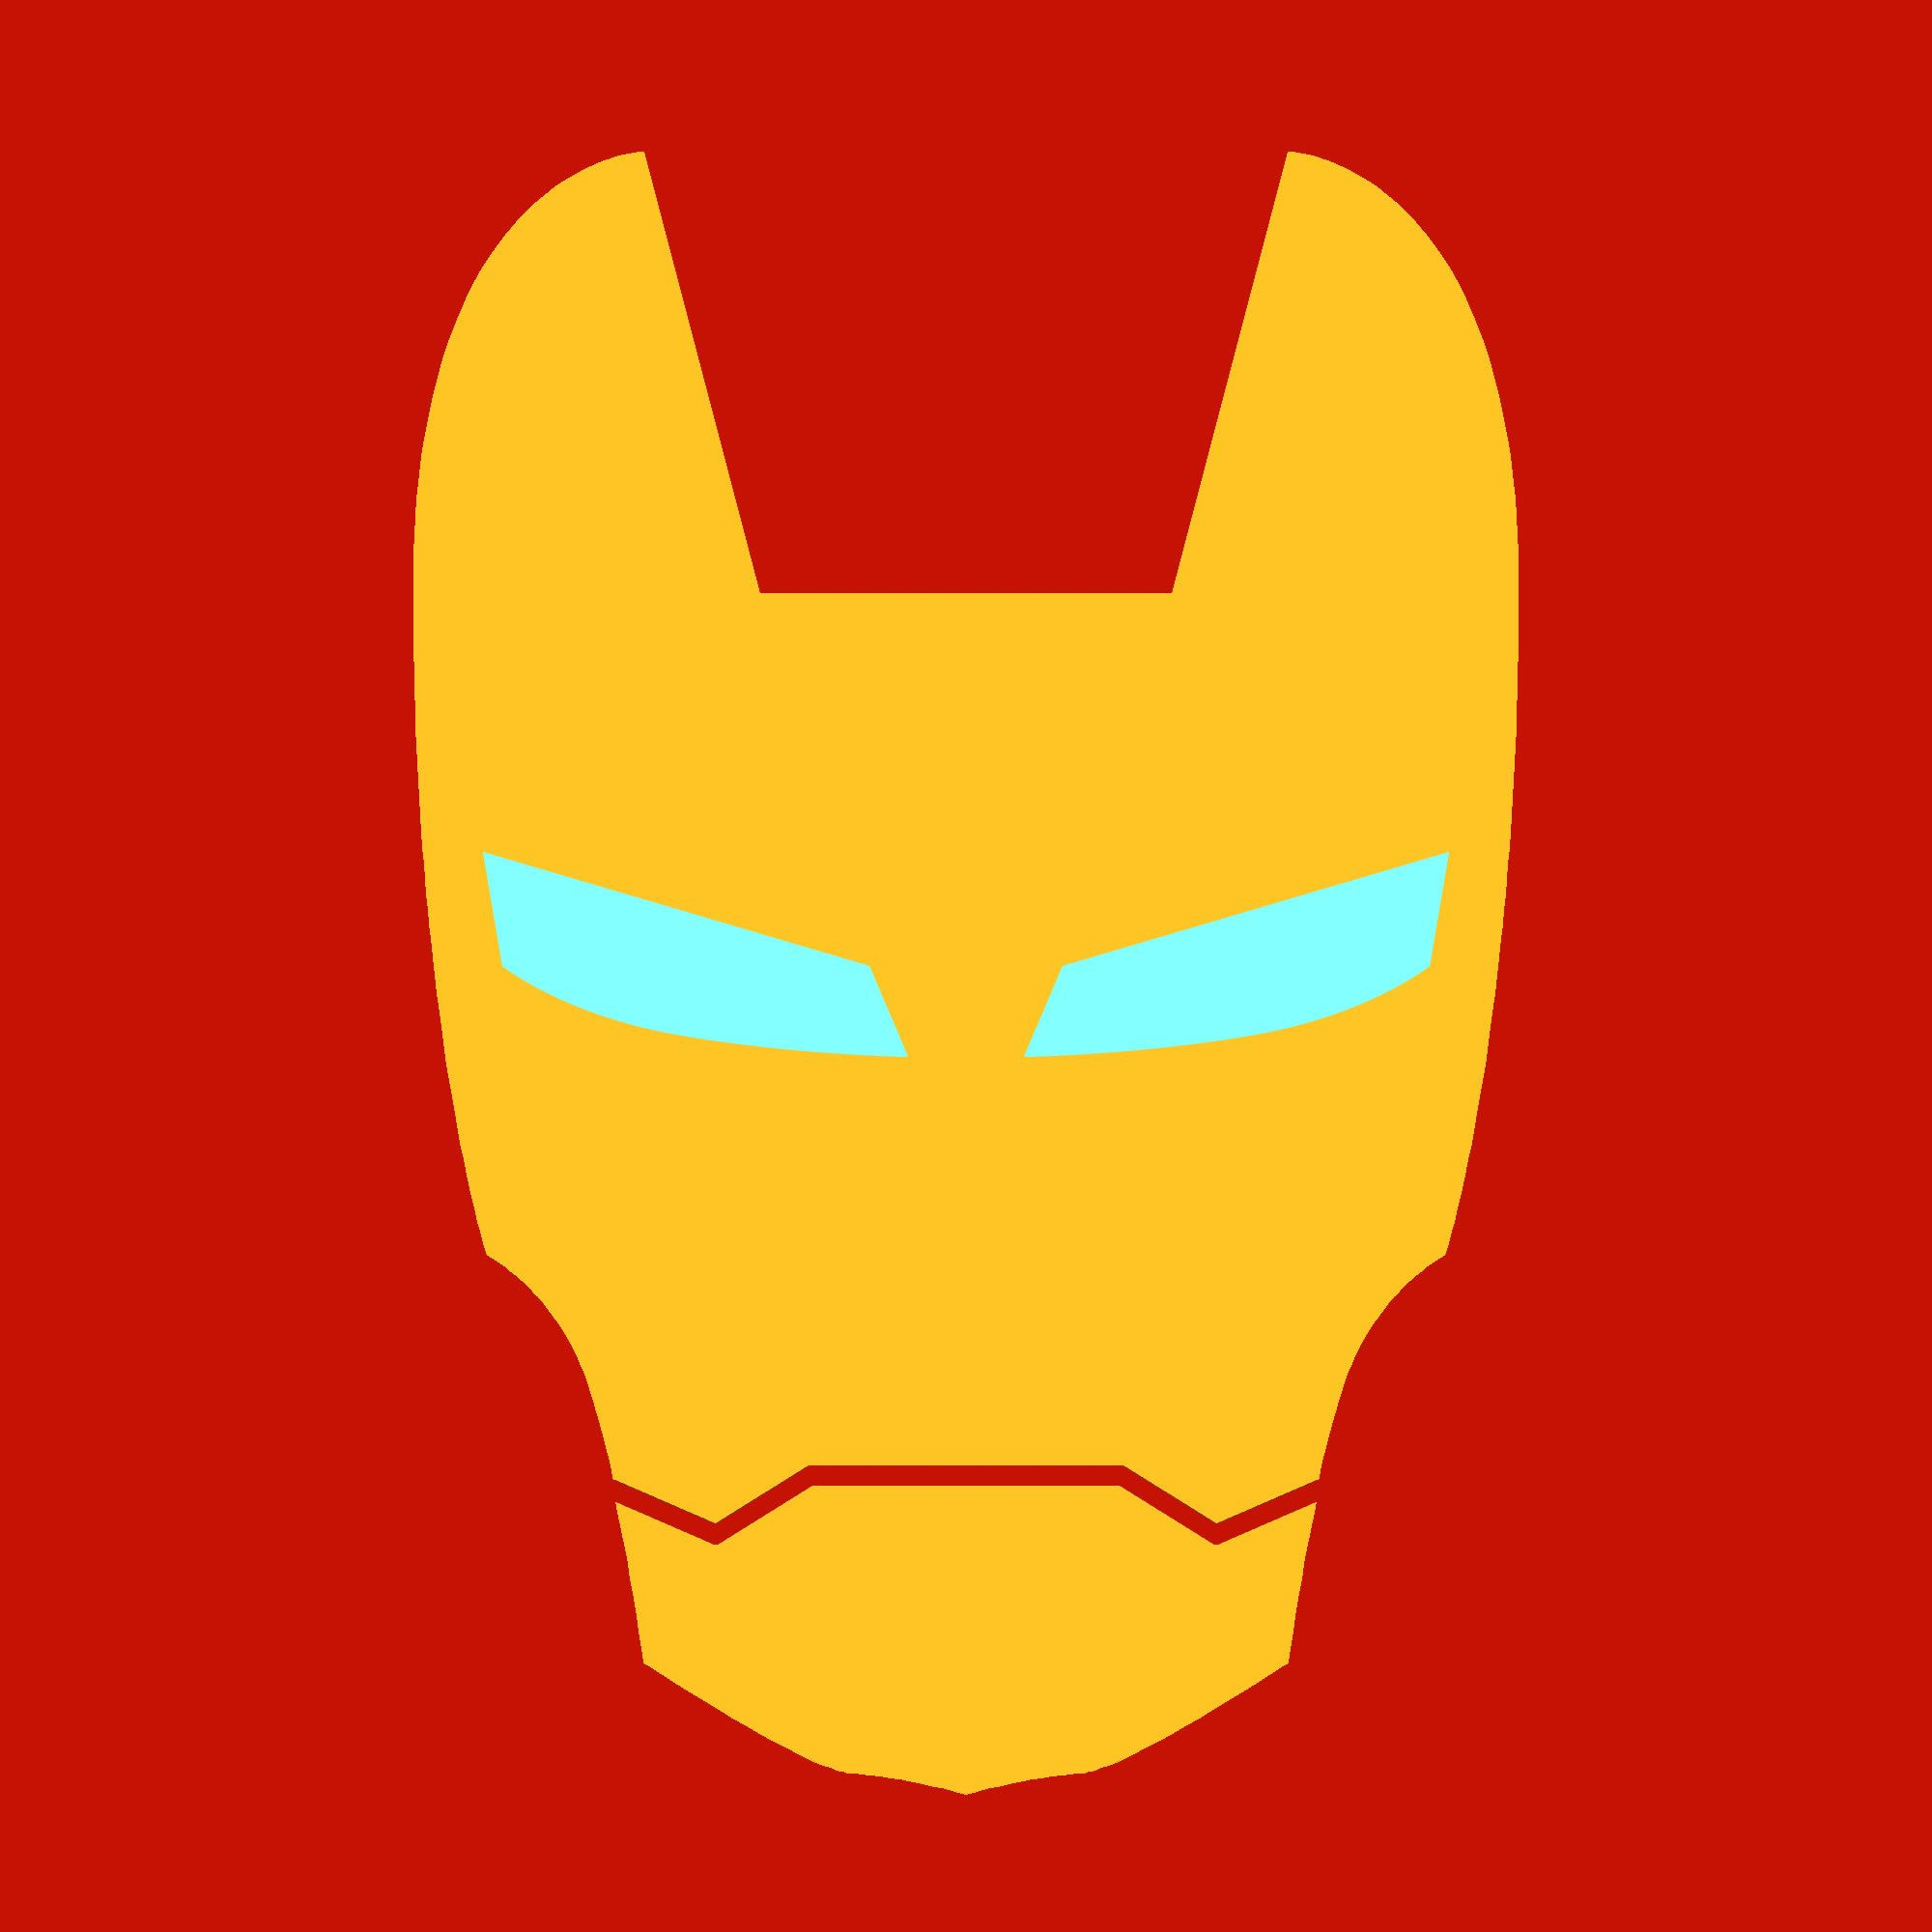 2000x2000 Iron Man Logo Vector Art By Techhead55 Superhero